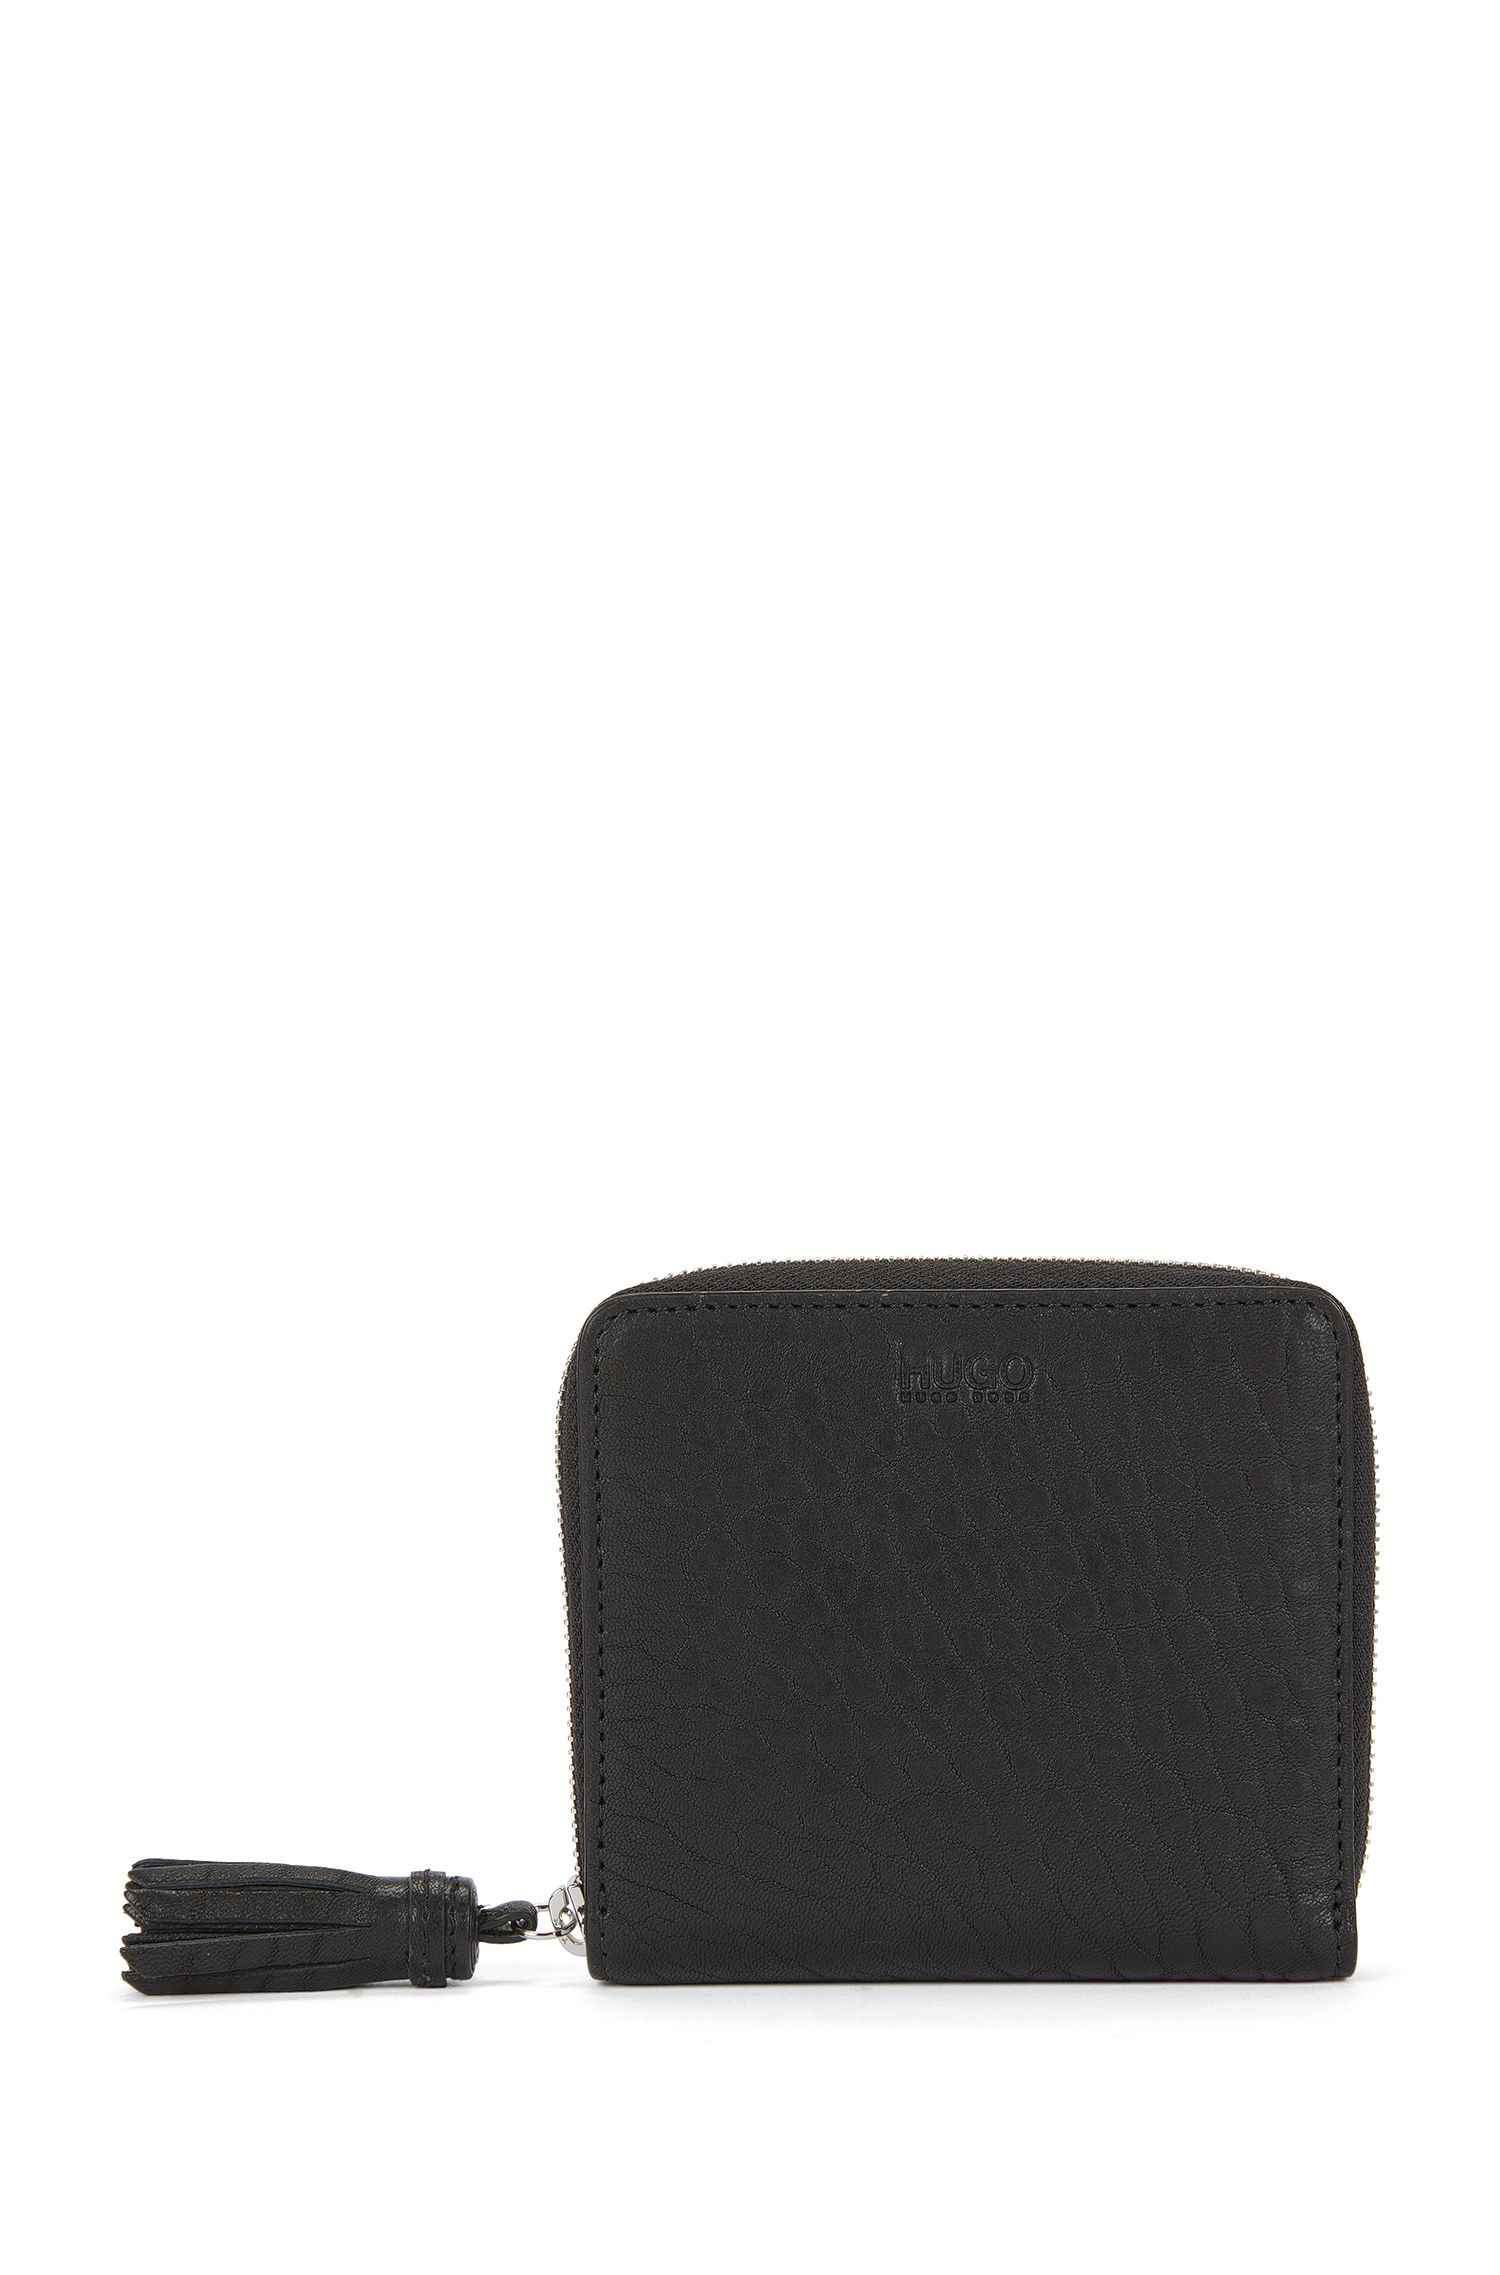 Zip-around leather wallet with tassel